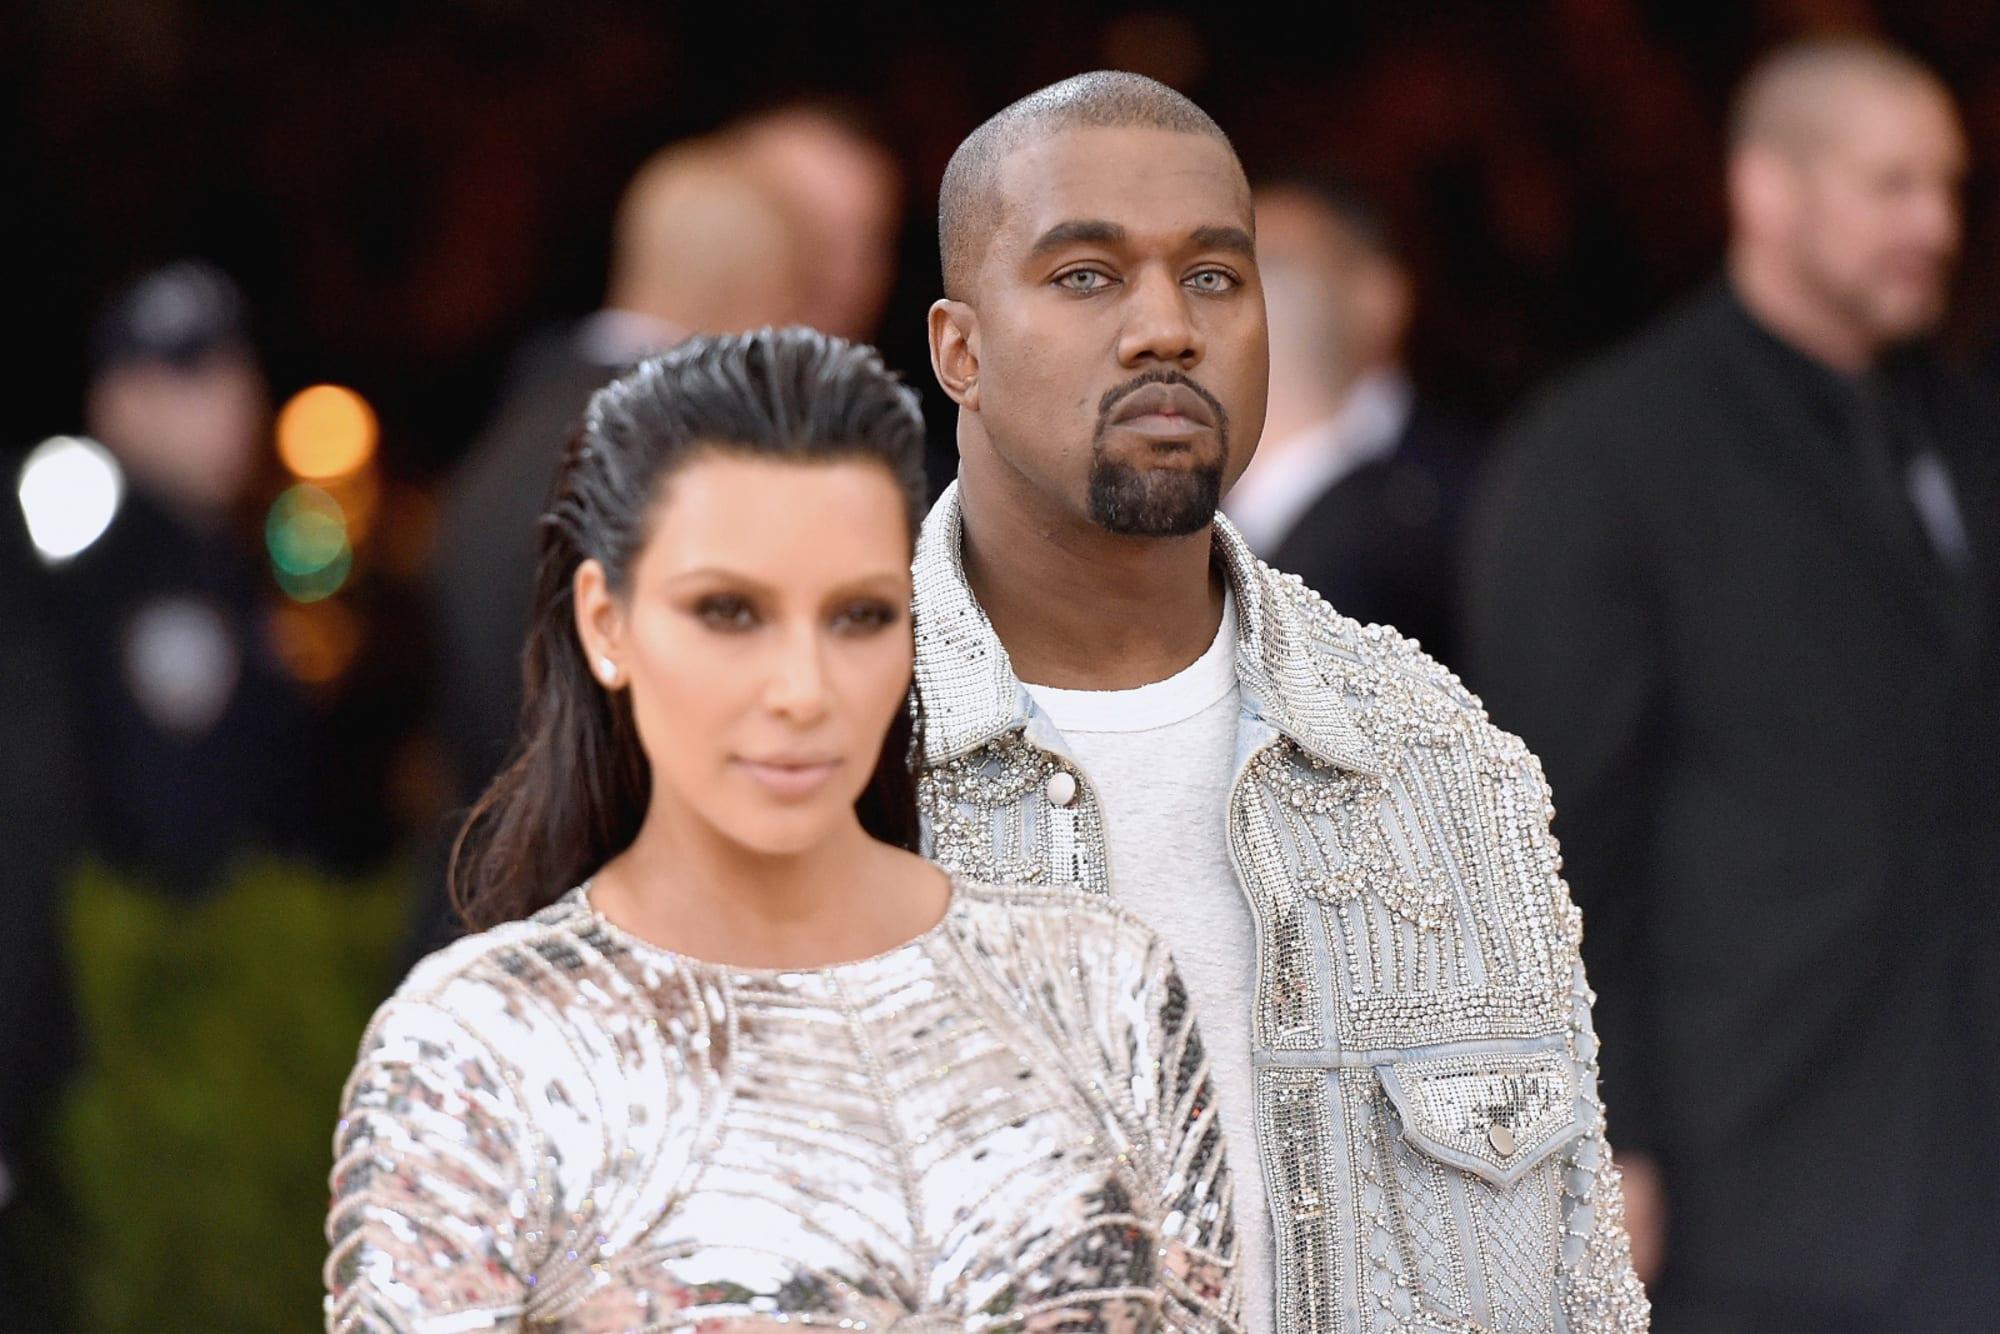 Did Kanye West cheat on Kim Kardashian? New lyrics spark rumors